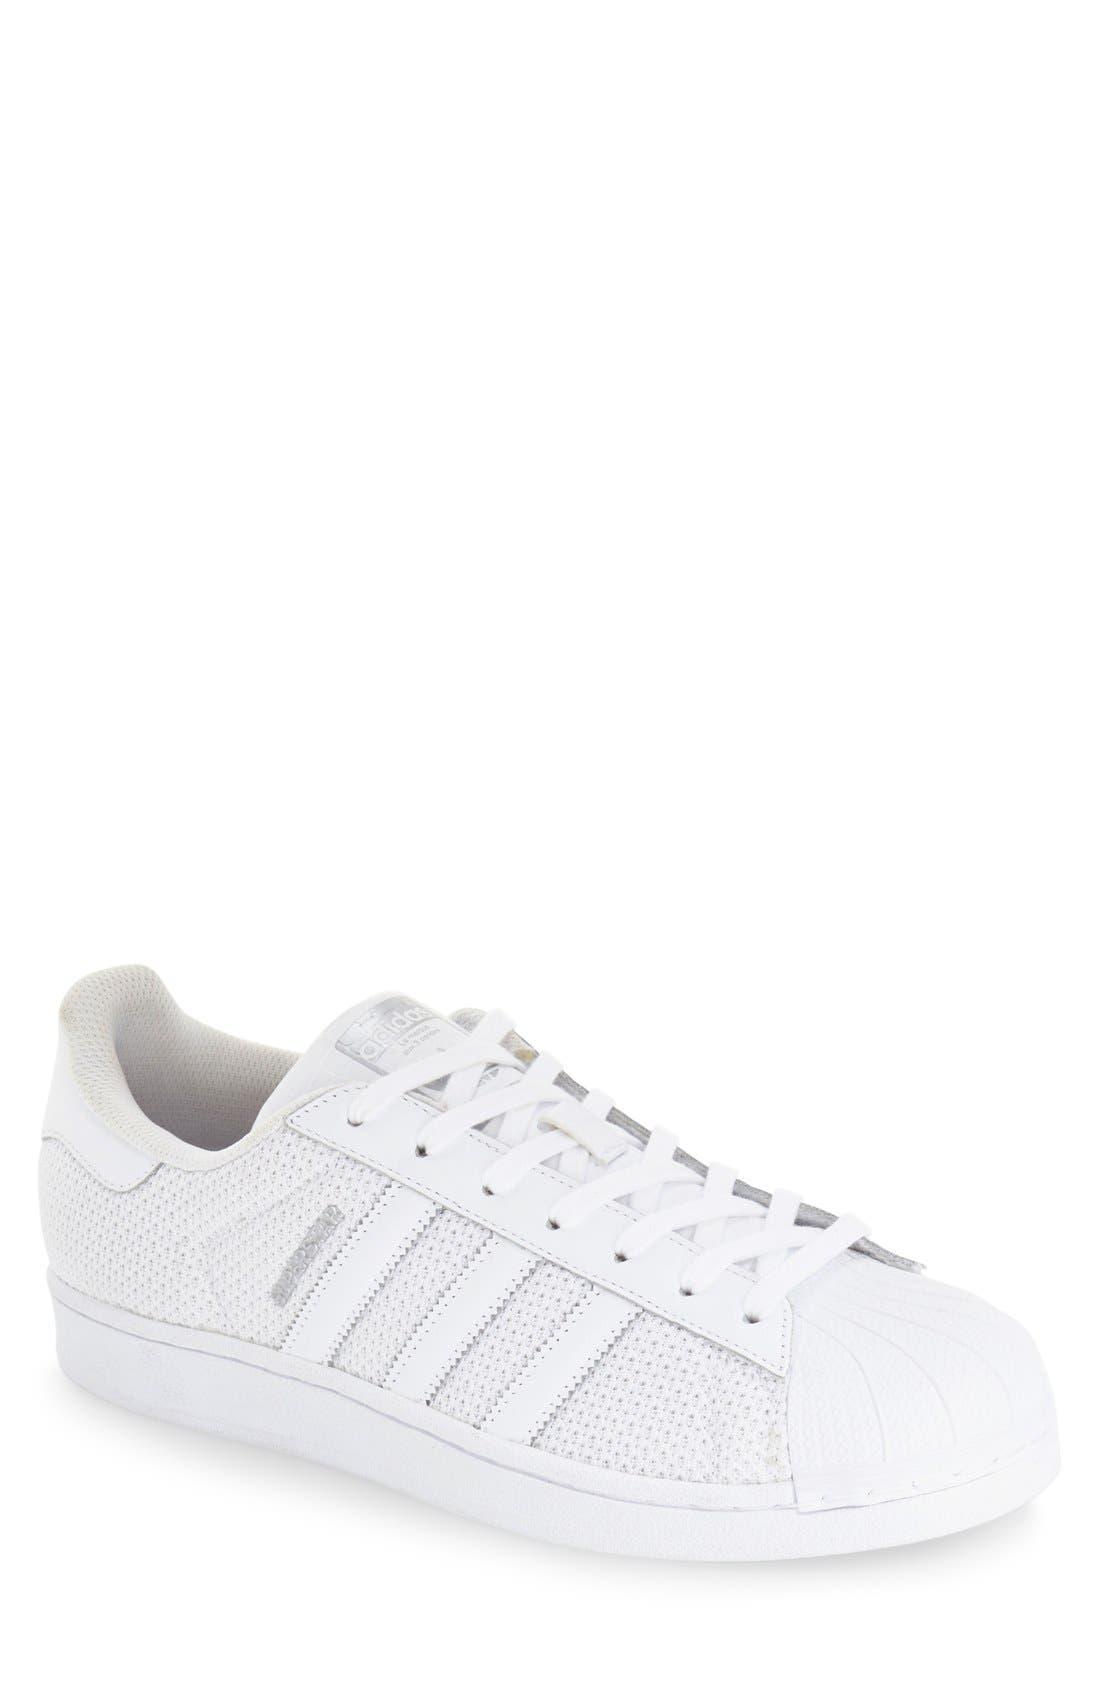 Alternate Image 1 Selected - adidas 'Superstar' Mesh Sneaker (Women)